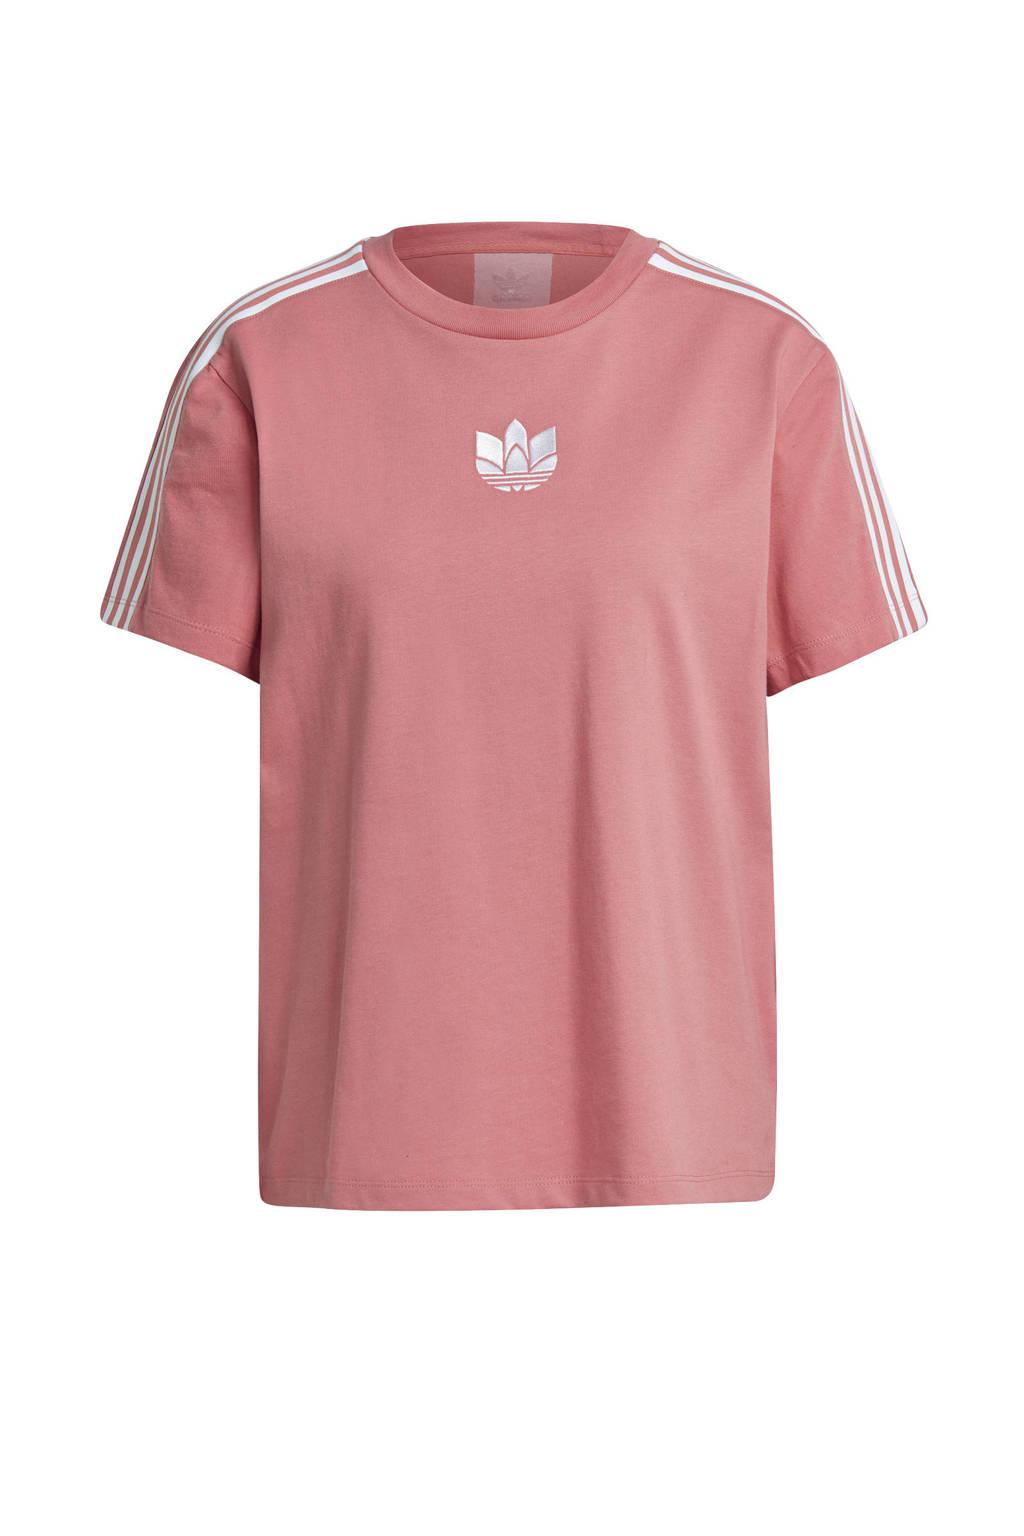 adidas Originals Adicolor T-shirt roze, Roze